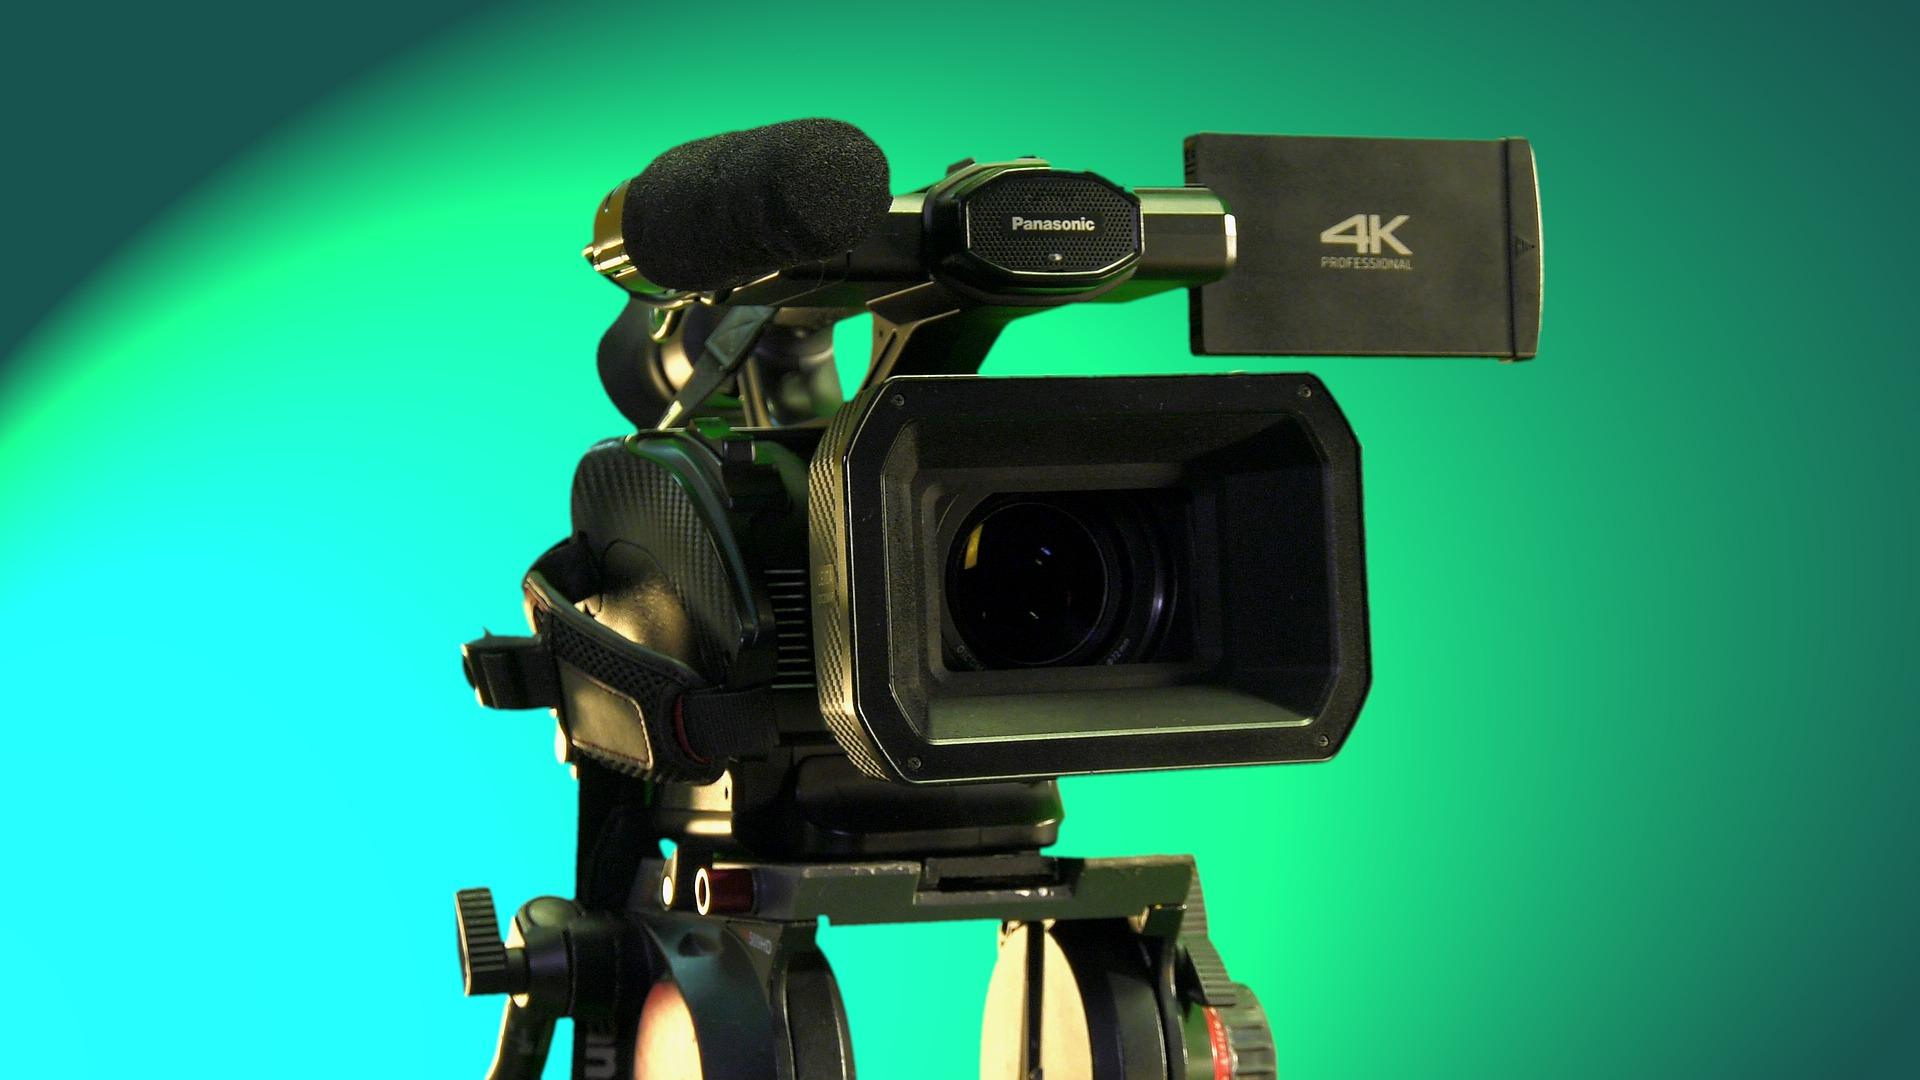 is 4k video recording worth it